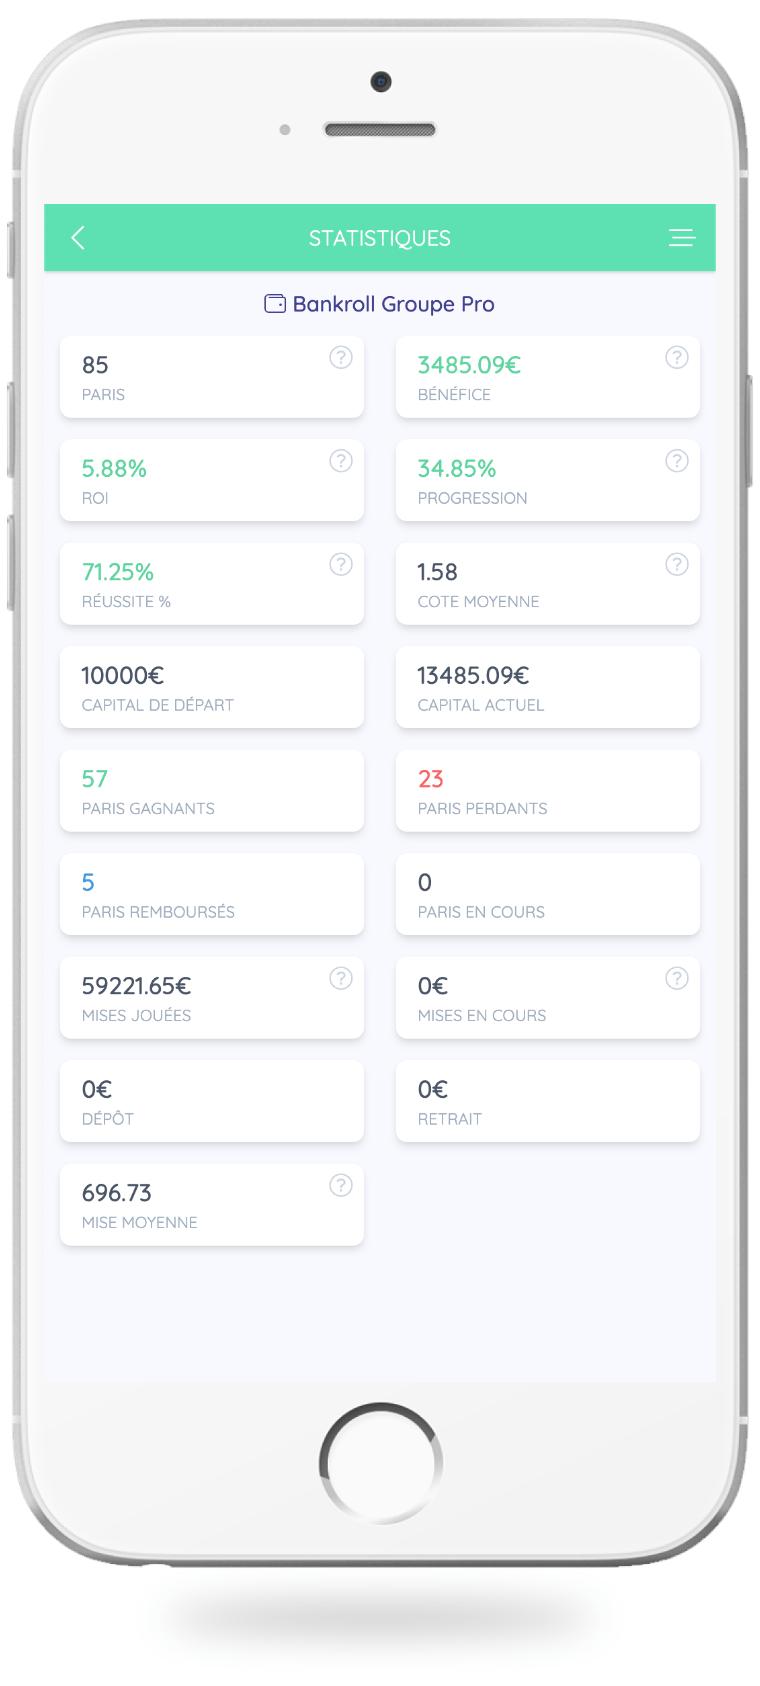 Les statistiques dans Bet Analytix